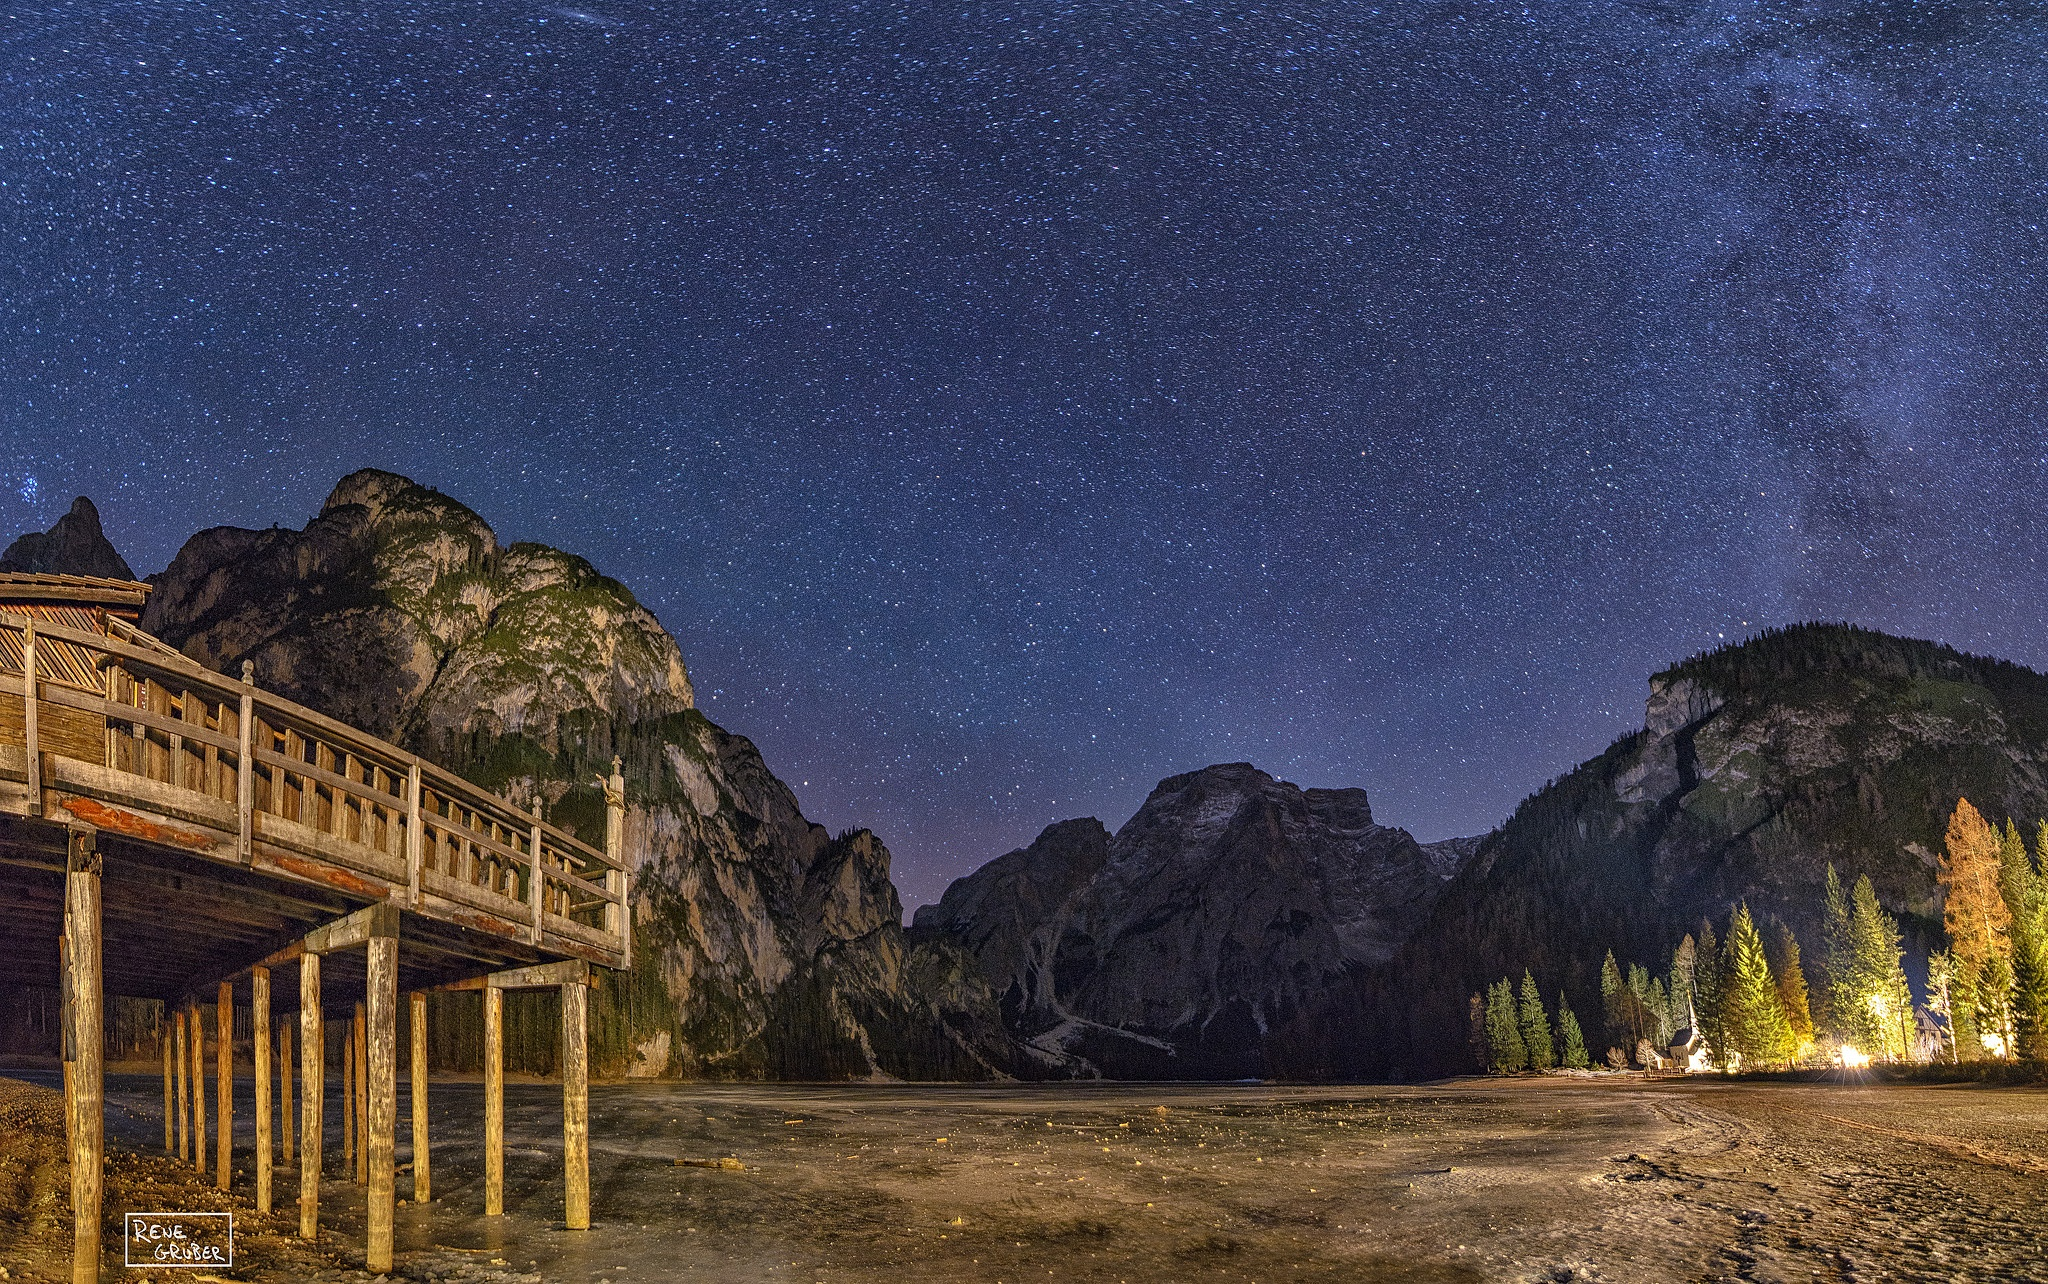 Lake Braies under the stars by Rene Gruber